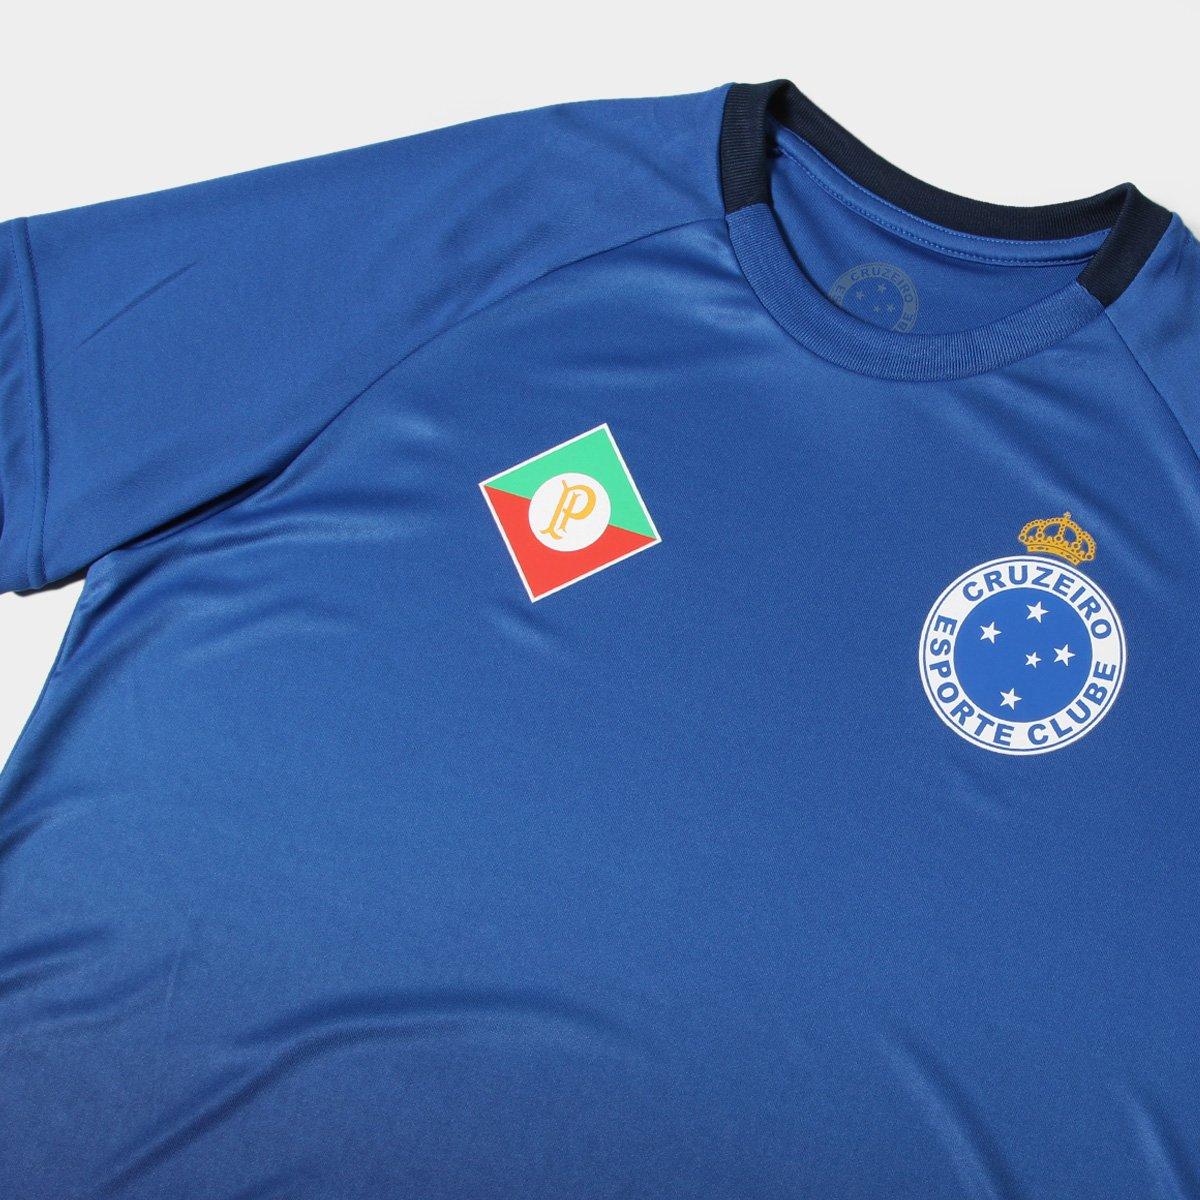 Camisa Cruzeiro 2009 s nº Masculina - Azul - Compre Agora  83c437068feff